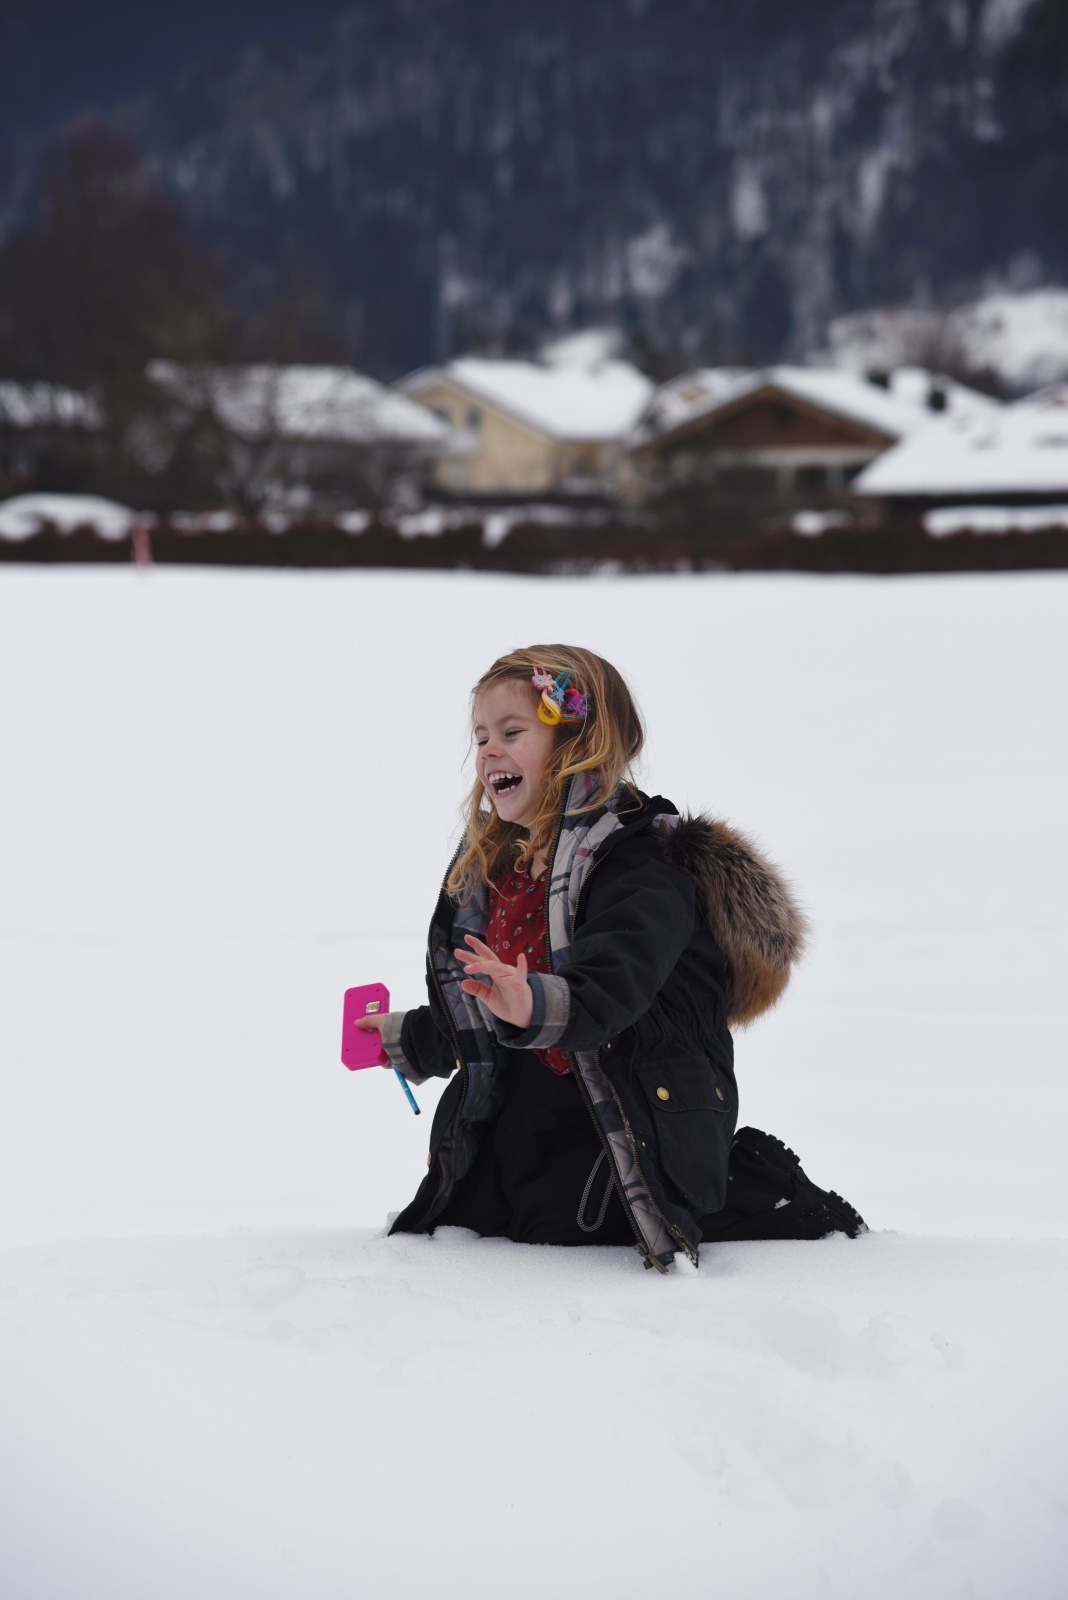 Winterurlaub mit Kind